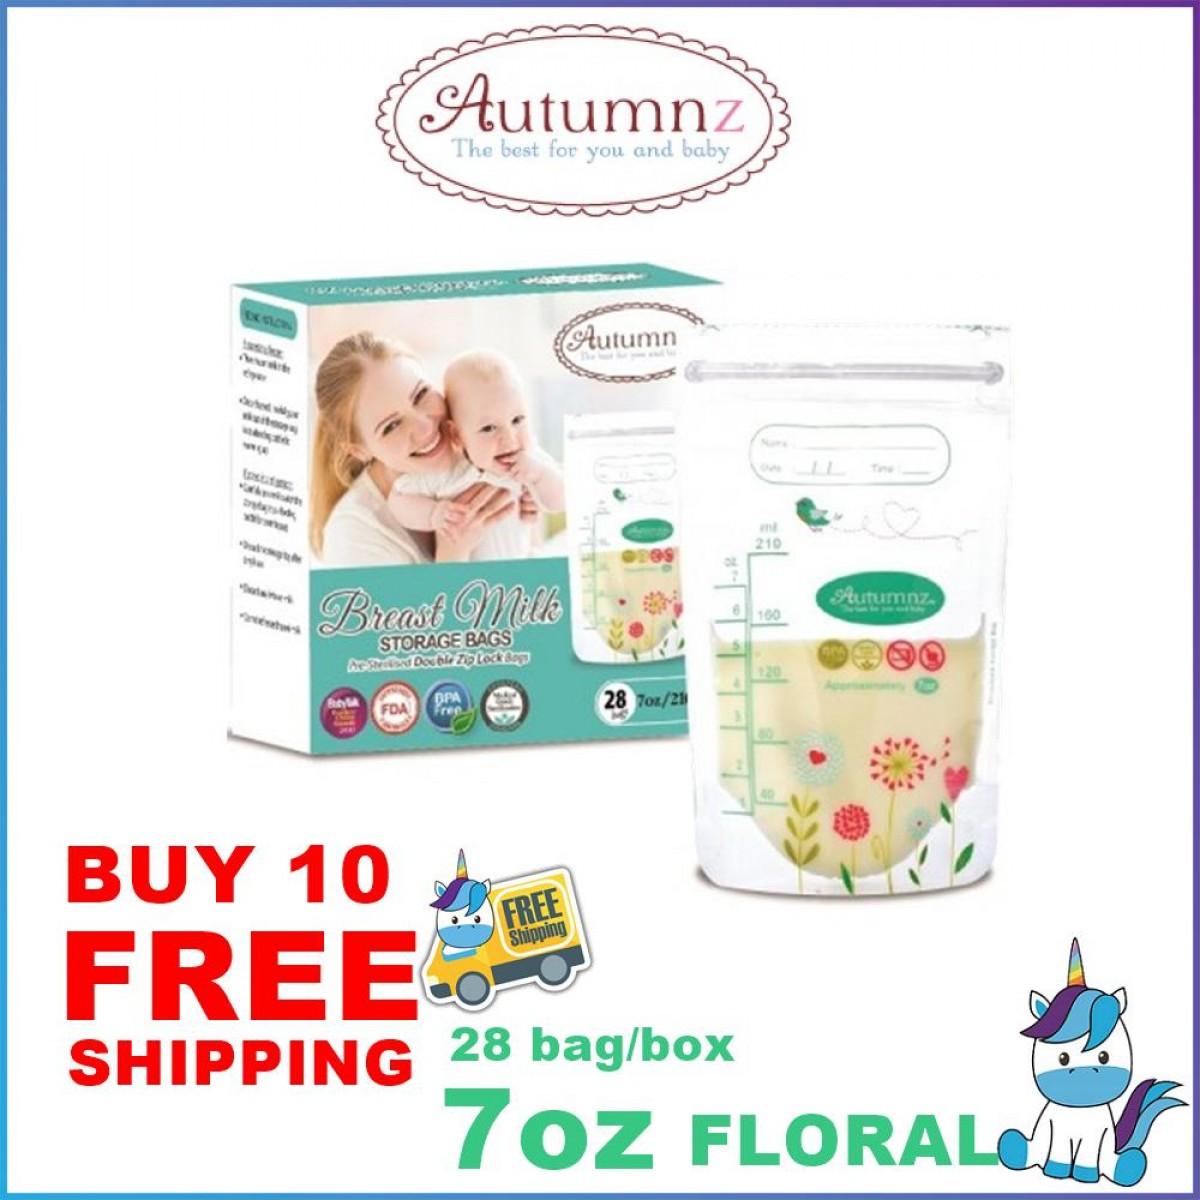 FREE SHIPPING - 10 BOXES  Autumnz Double ZipLock Breast Milk Storage Bag / Bag Susu (28 Bags) 3.5oz / 5oz / 7oz / 10oz / 12oz